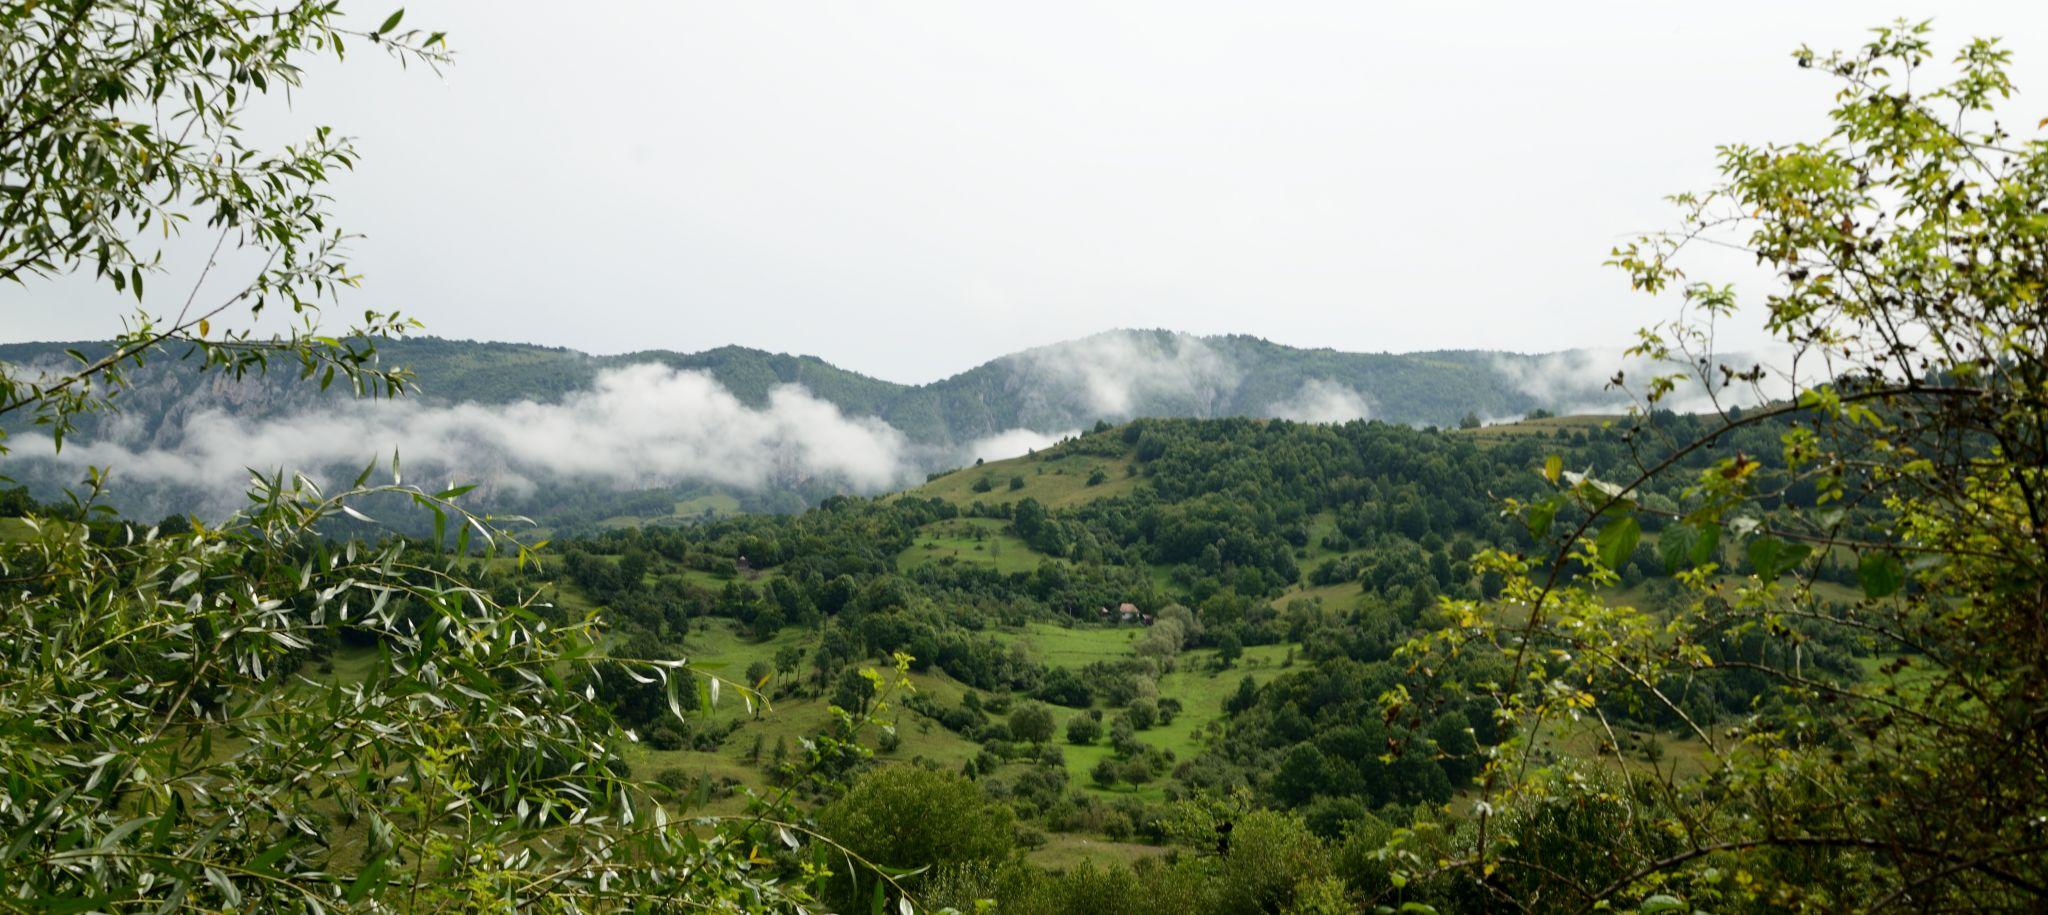 Dumesti, Romania